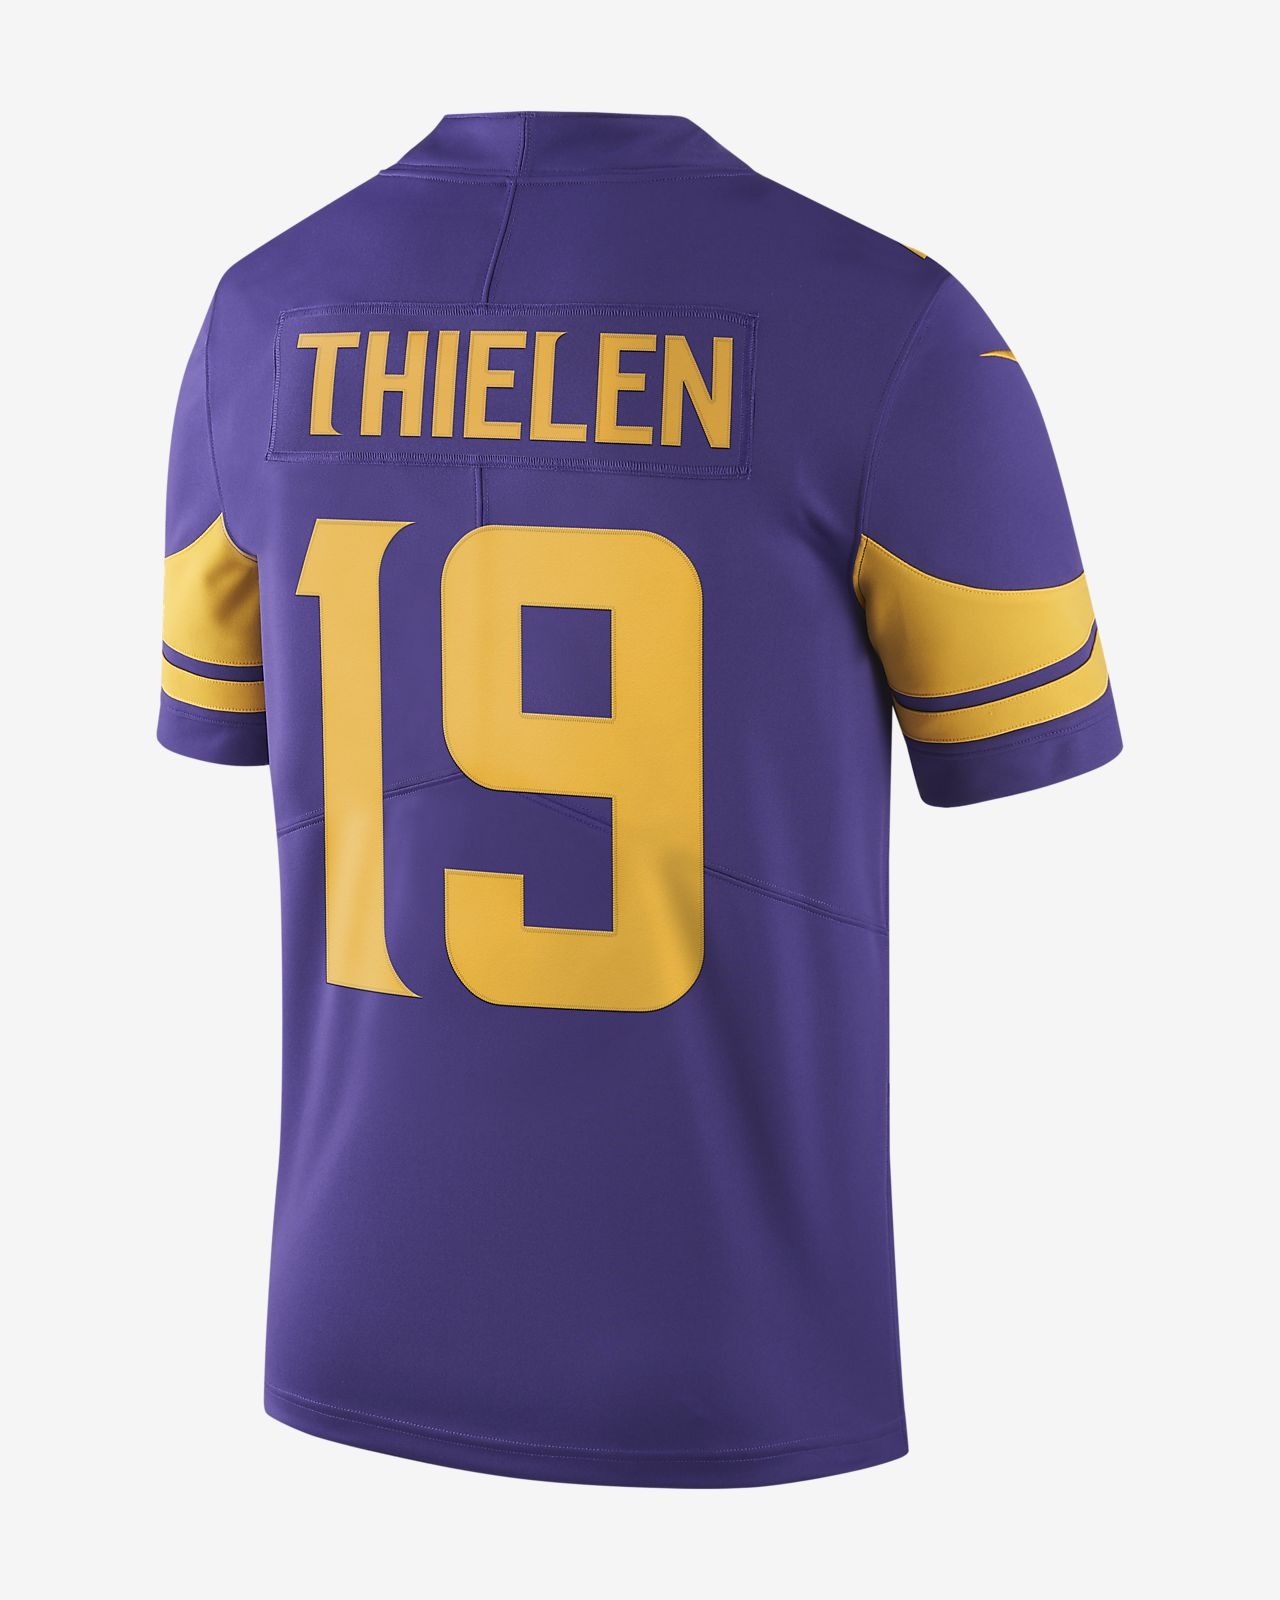 reputable site 6be60 079c6 NFL Minnesota Vikings Limited (Adam Thielen) Men's Football Jersey